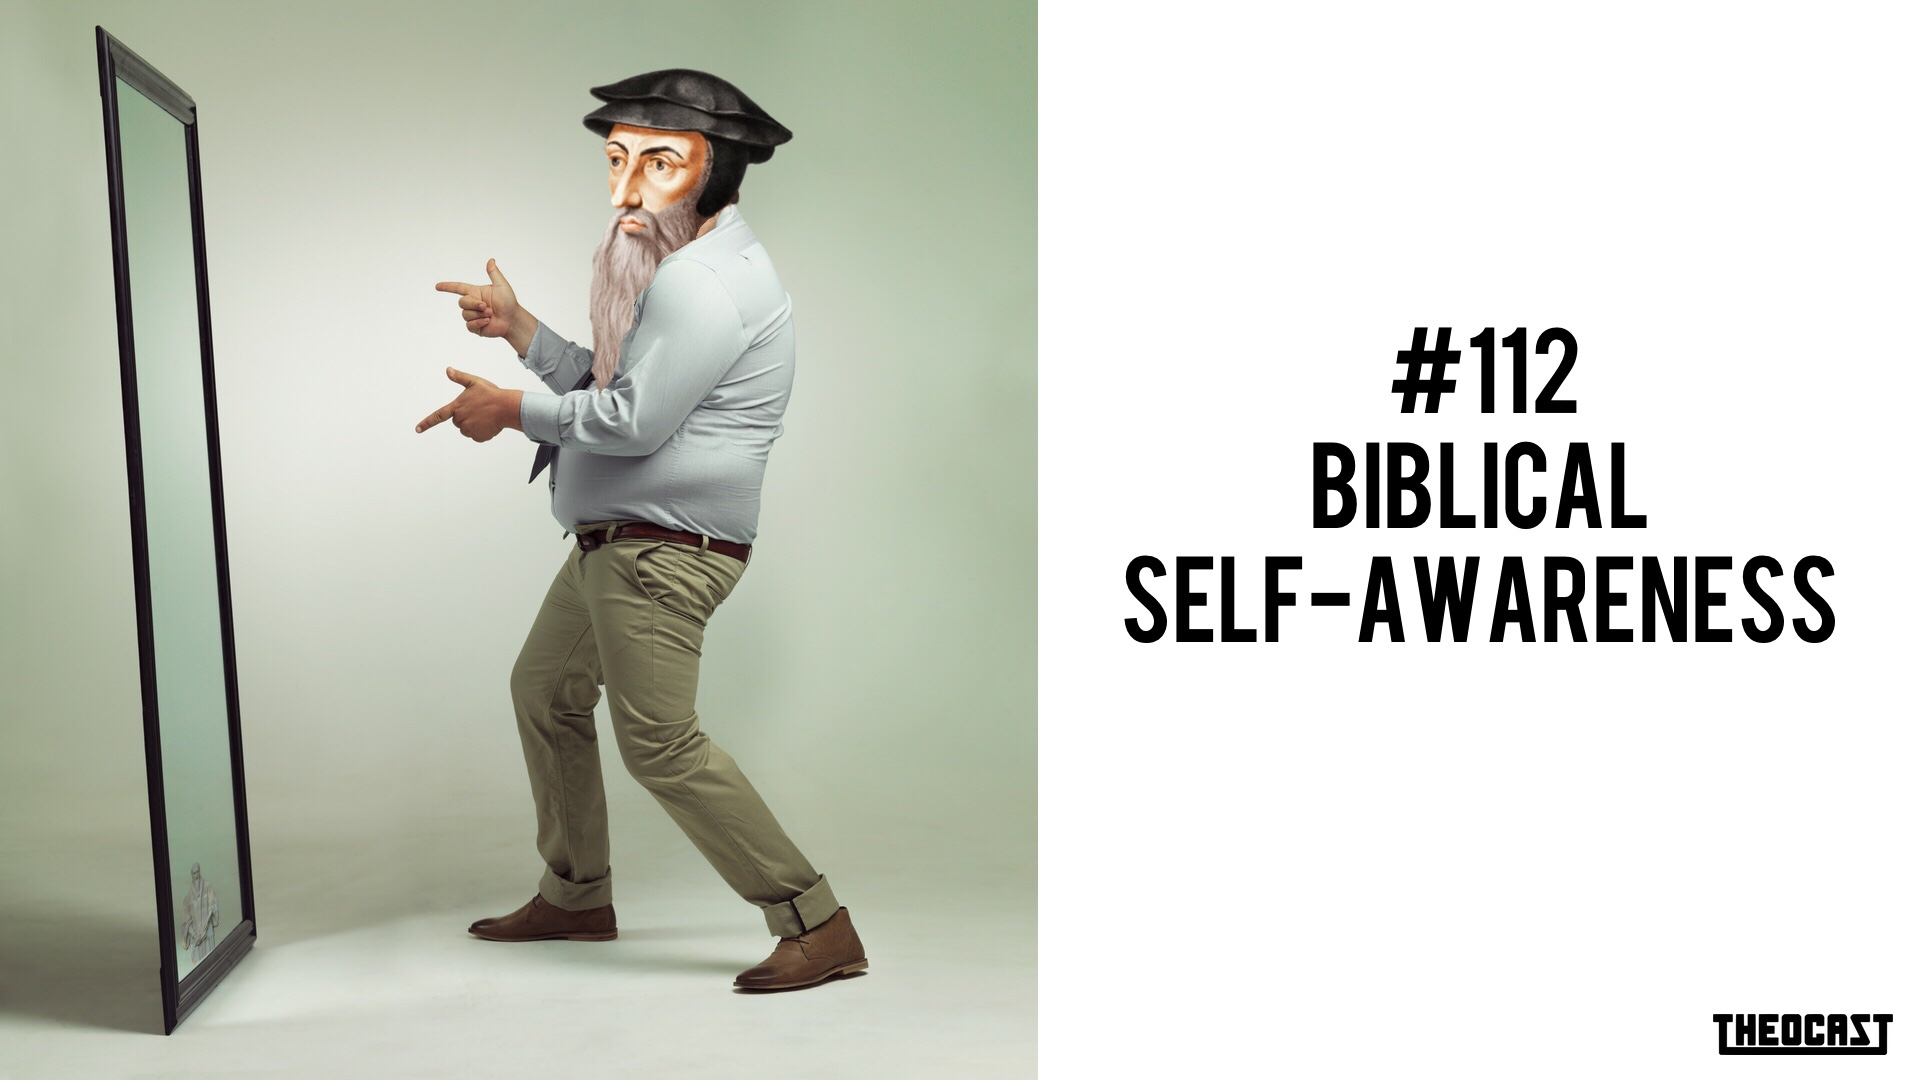 #112 Biblical Self-Awareness